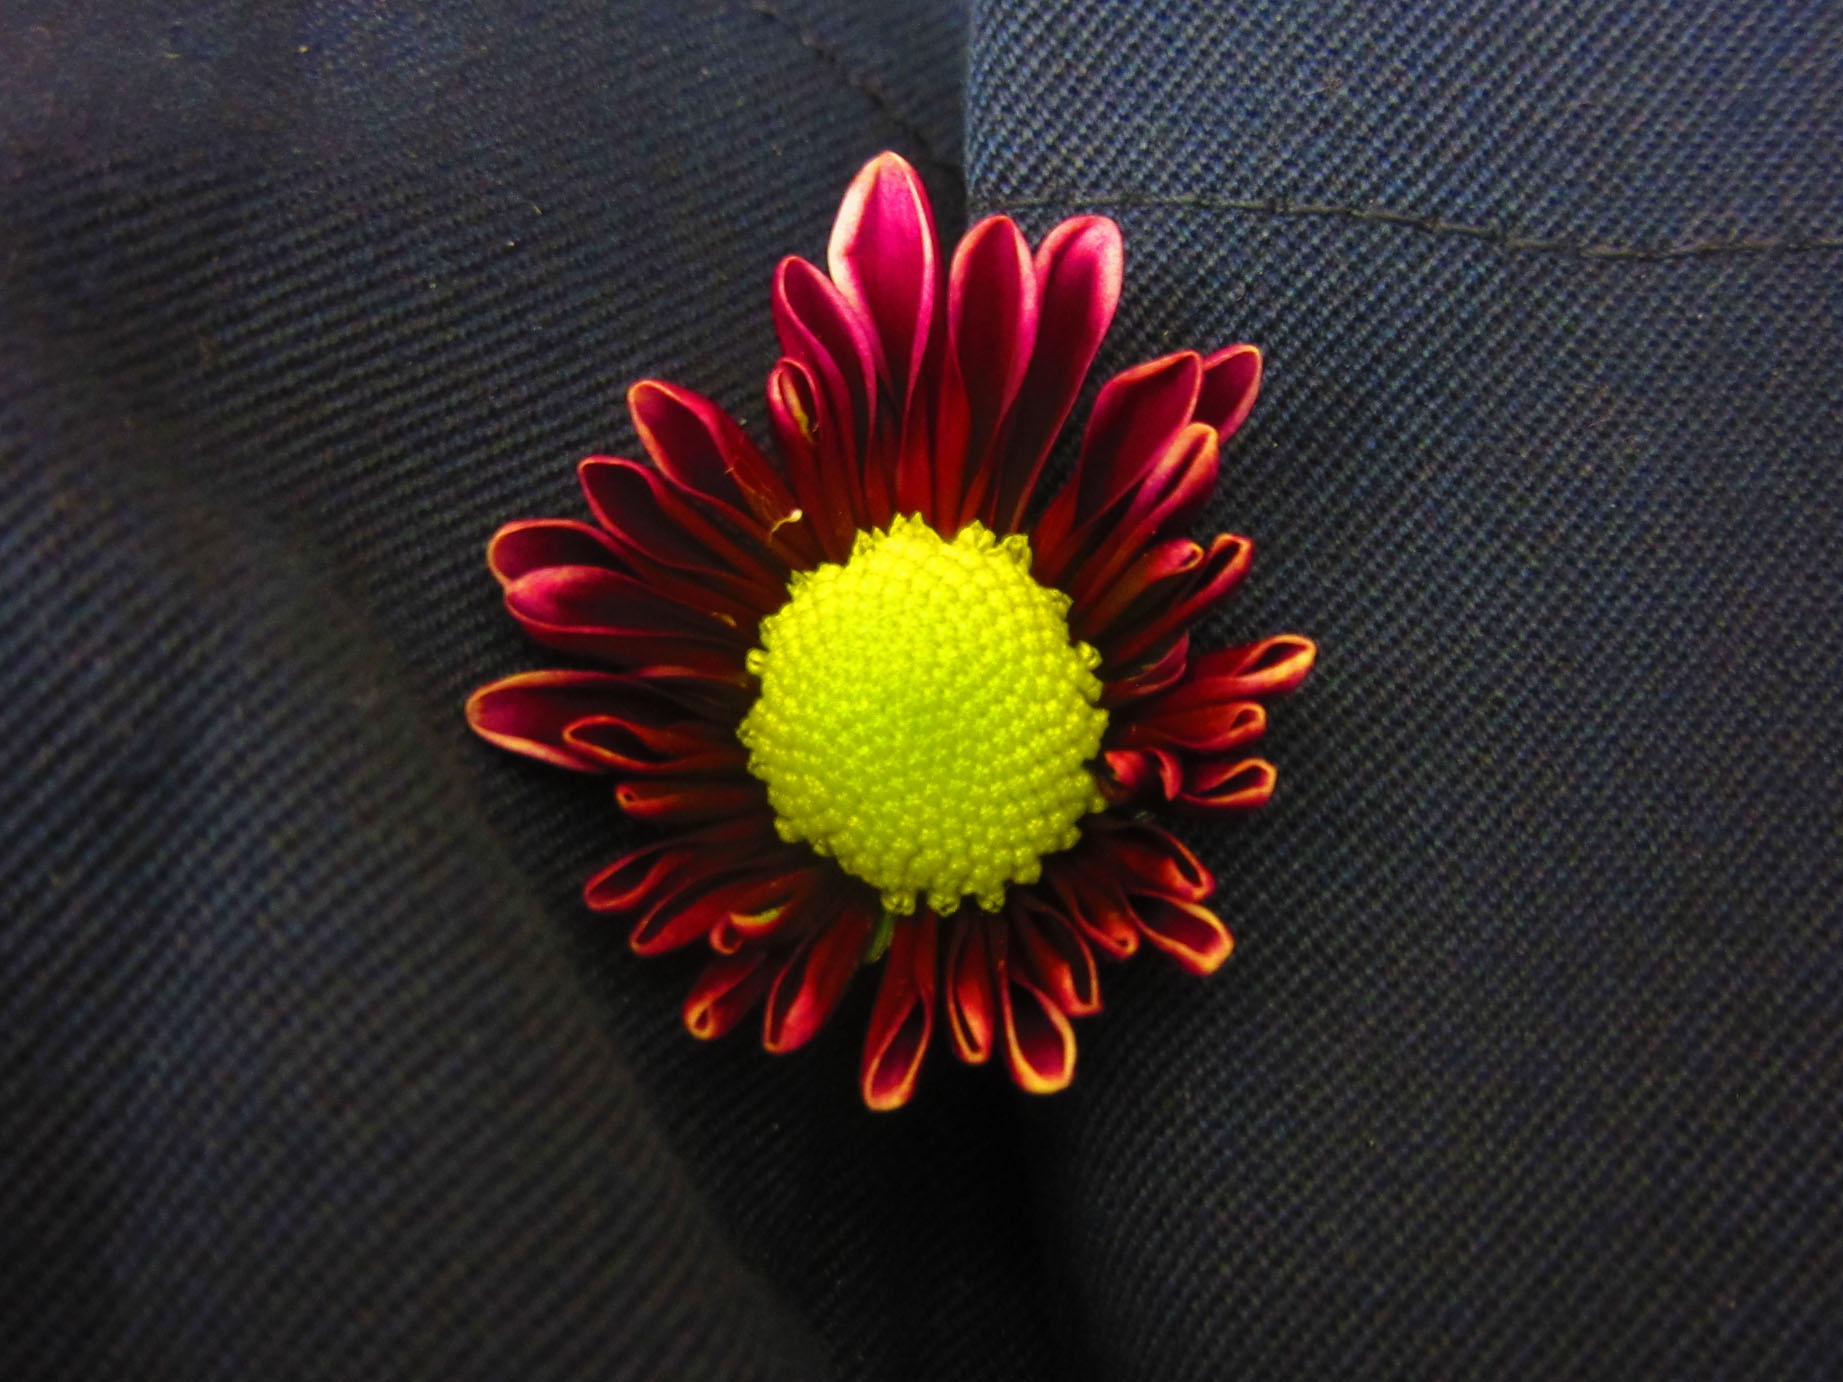 _flowers_stp_20141125_5324